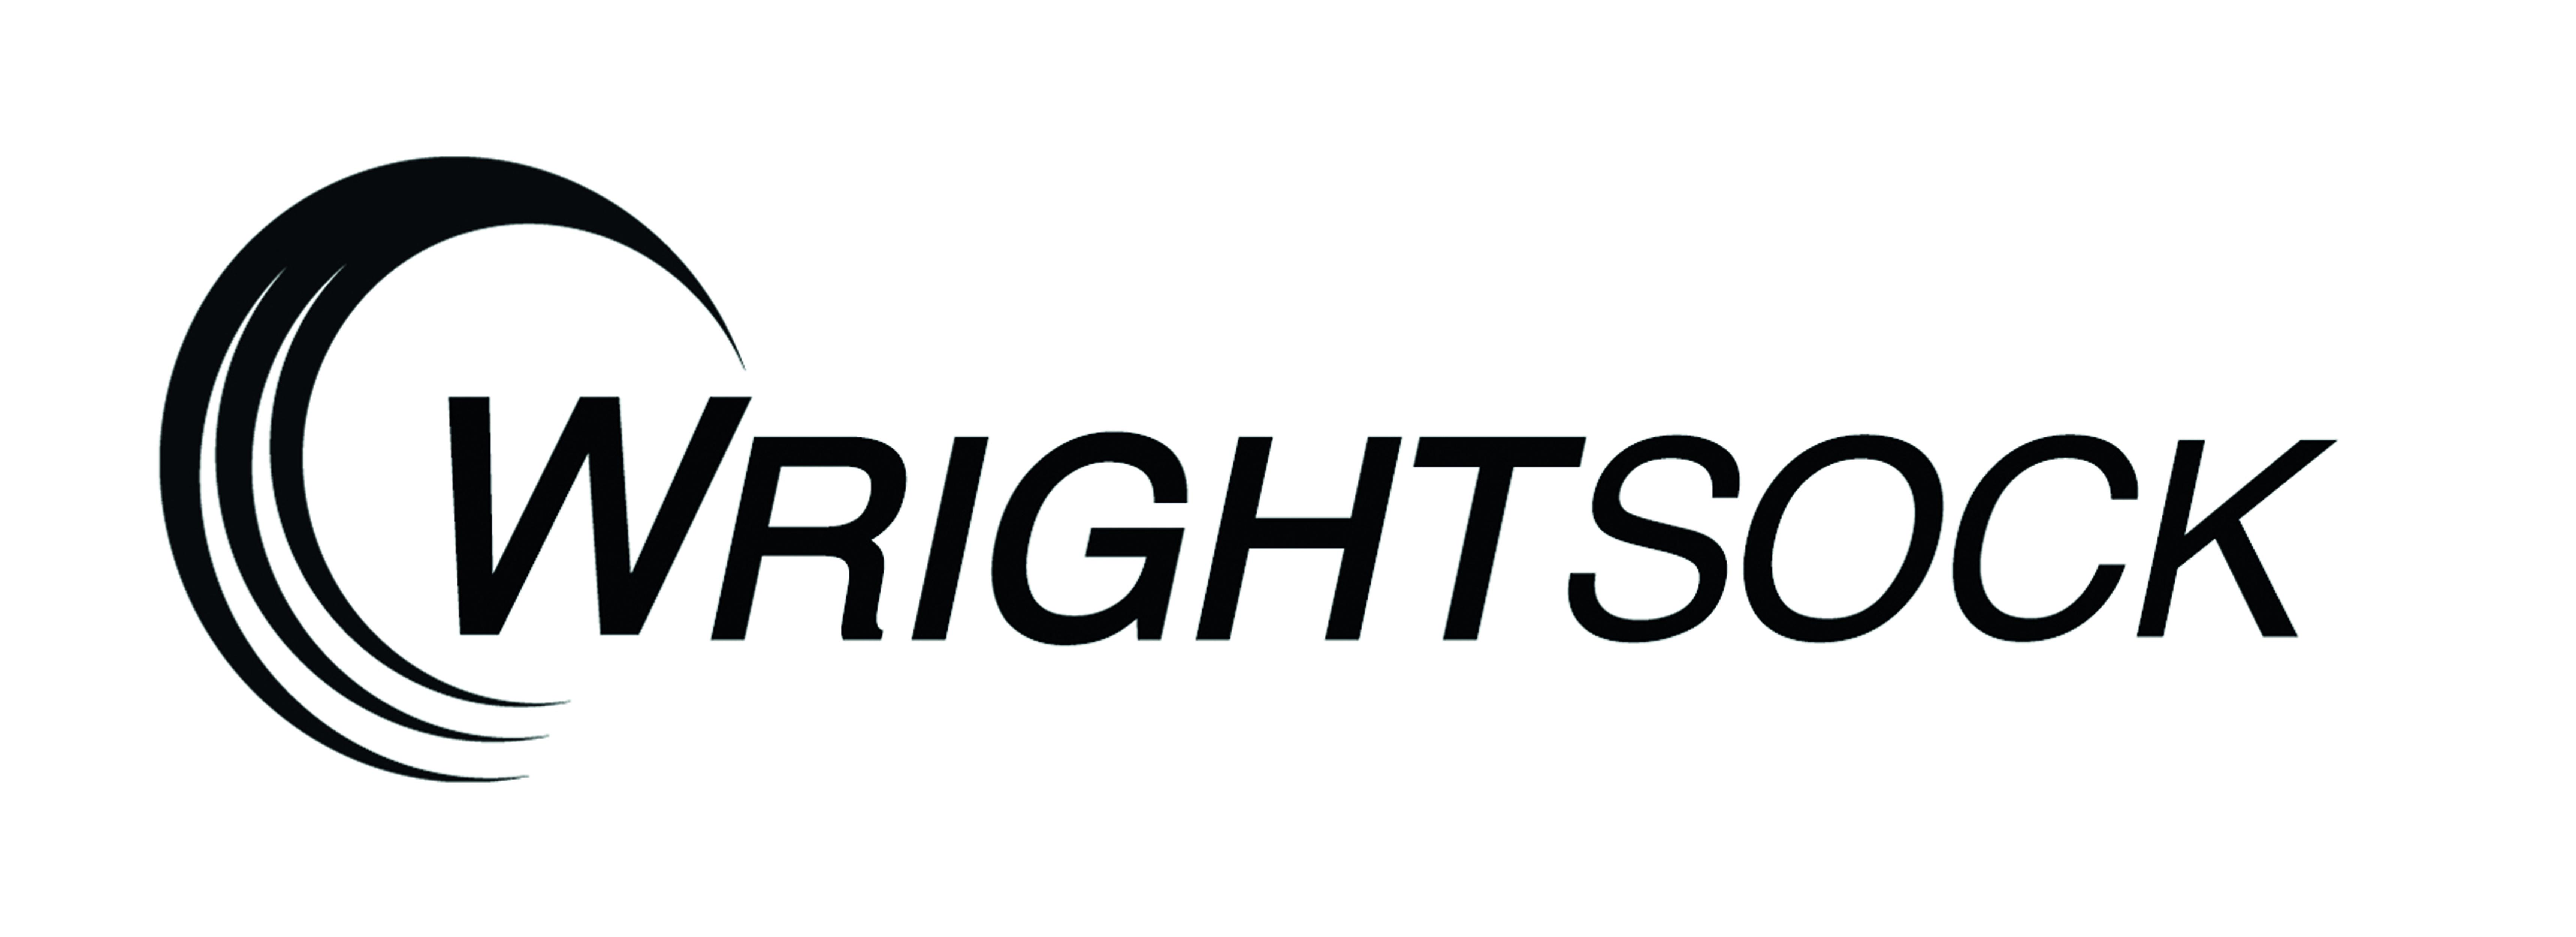 WRIGHTSOCK_logo_black_300_dpi.jpg